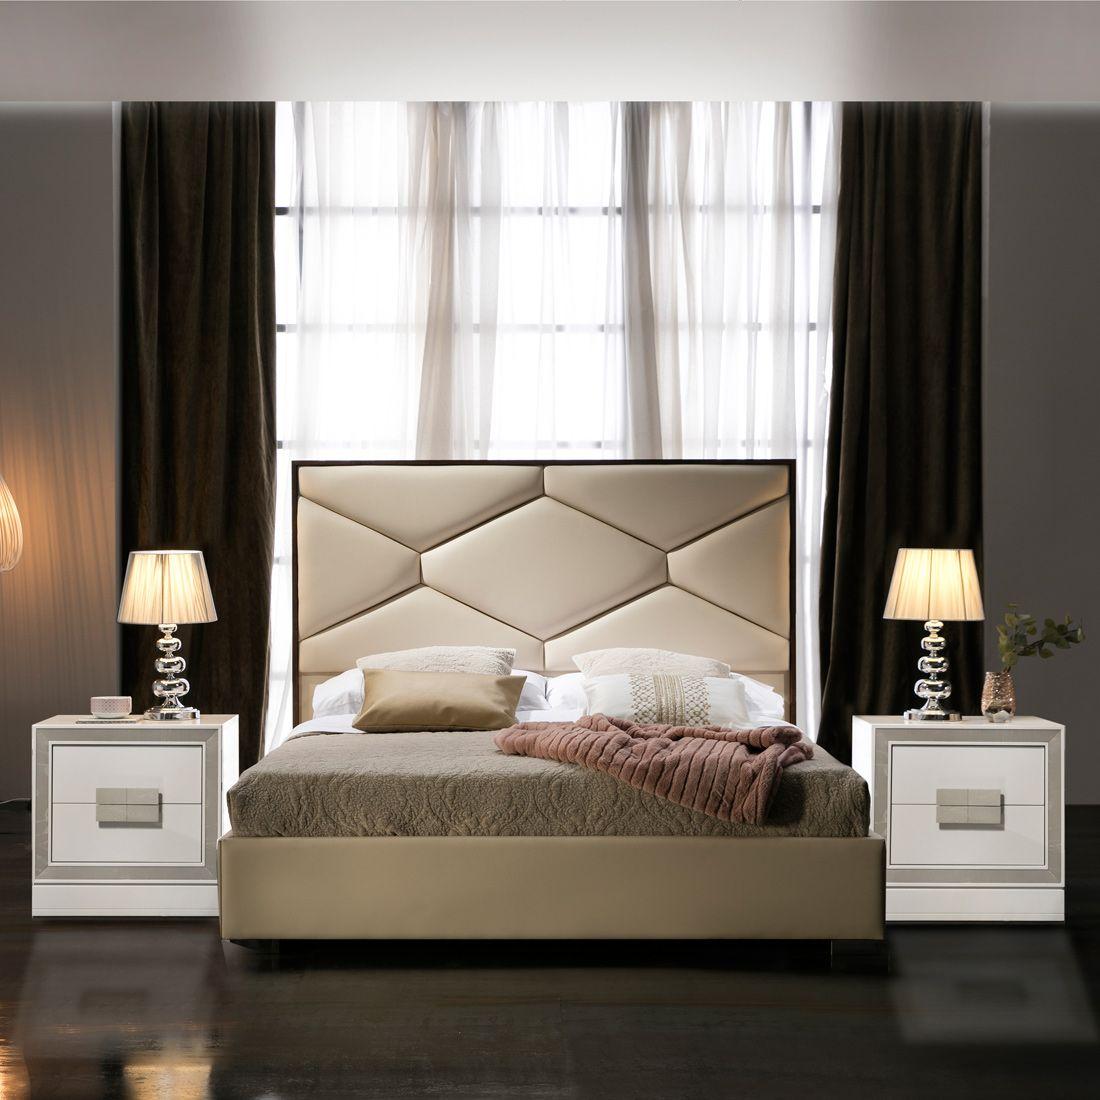 Esf Furniture Imports Martinabedqs Martina Queen Storage Bed Beige